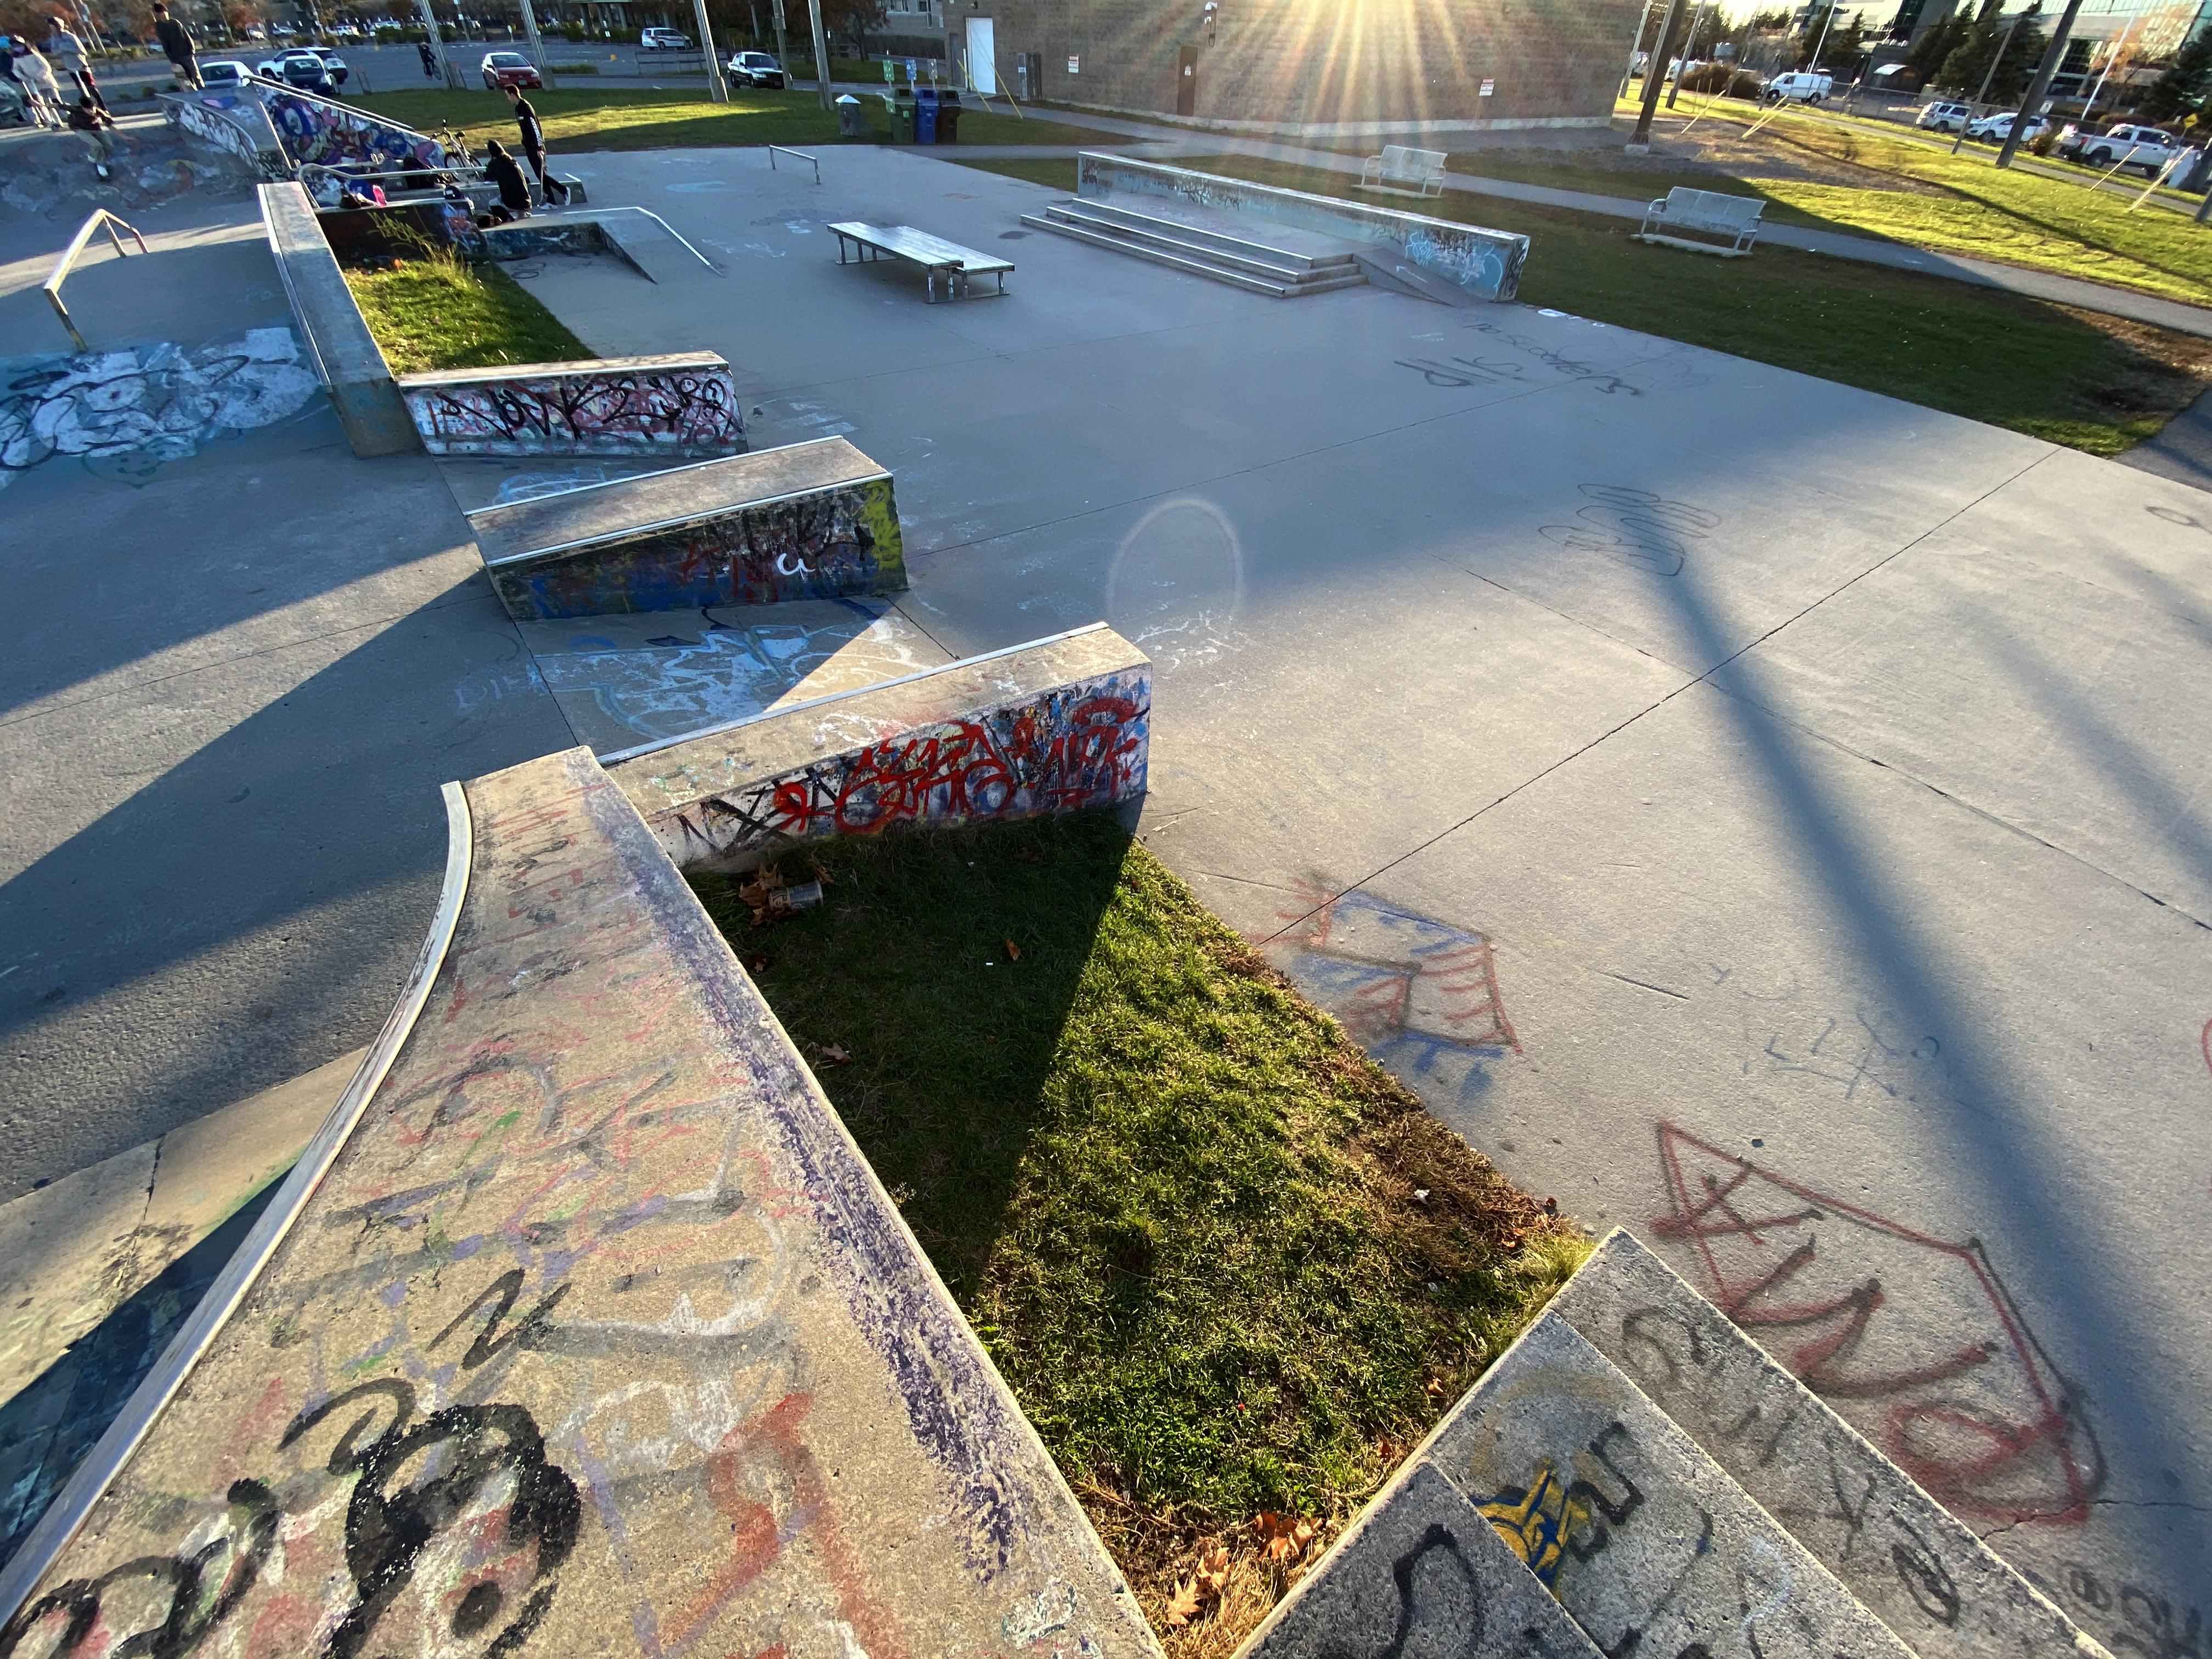 Ottawa legacy skatepark smaller street course from the back